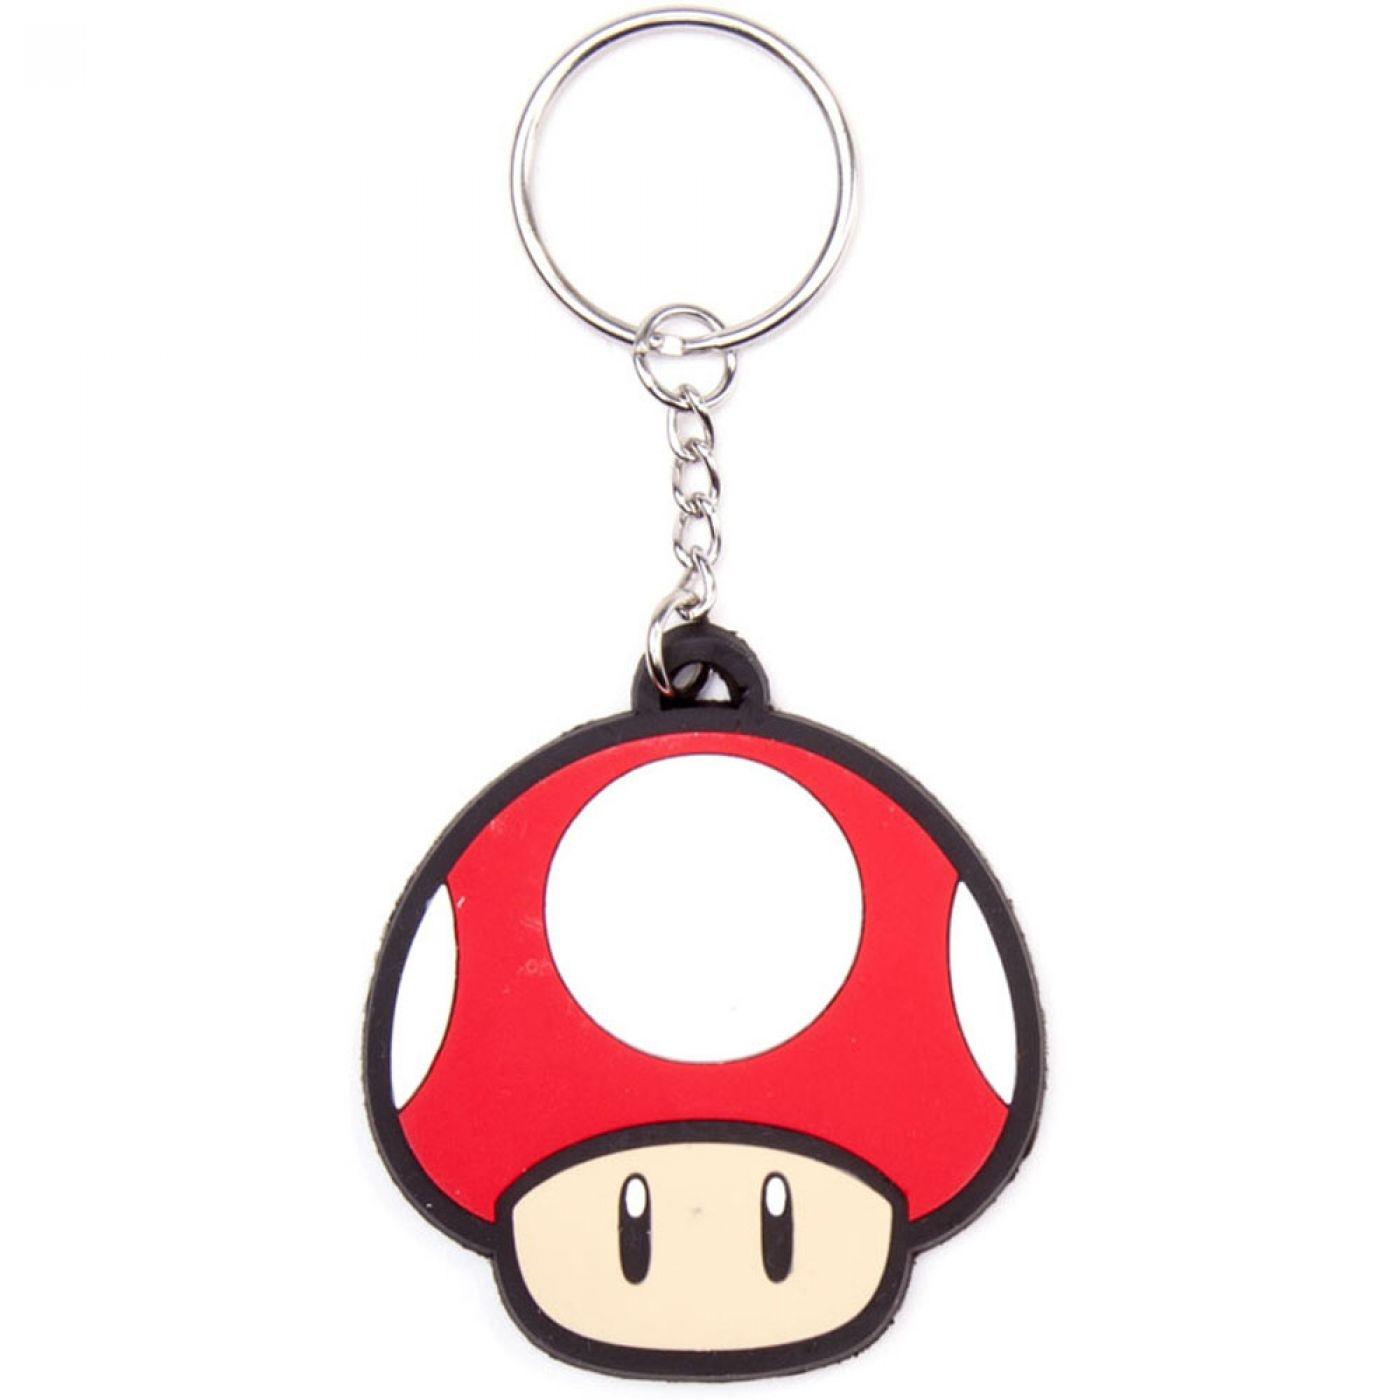 Nintendo Super Mario Bros Red Mushroom keychain